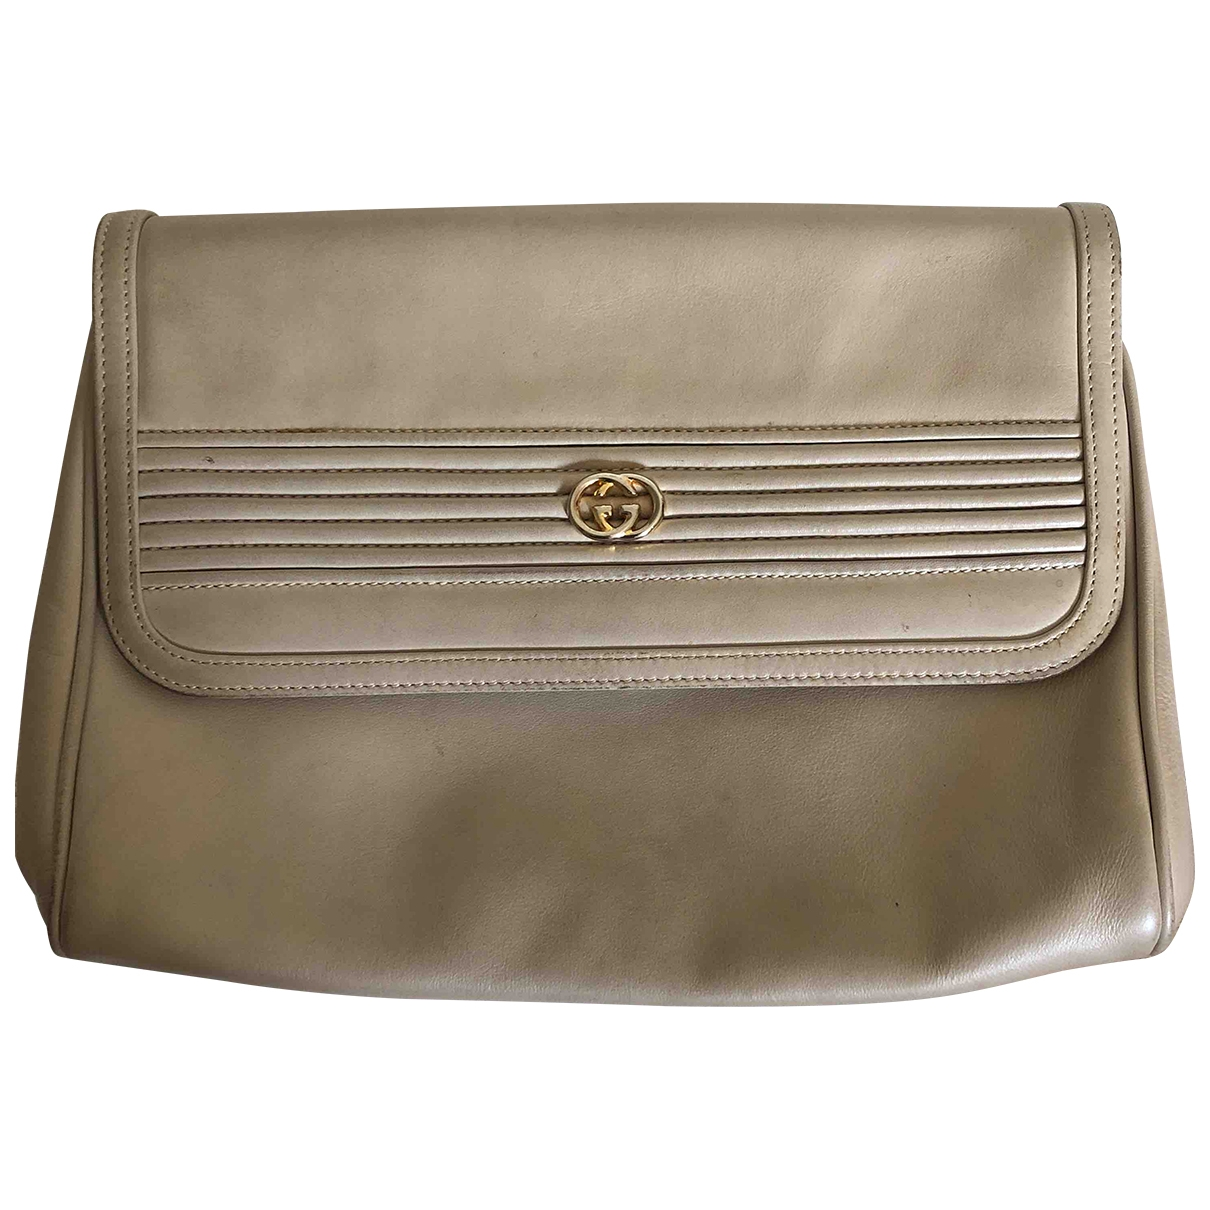 Gucci \N Beige Leather Clutch bag for Women \N